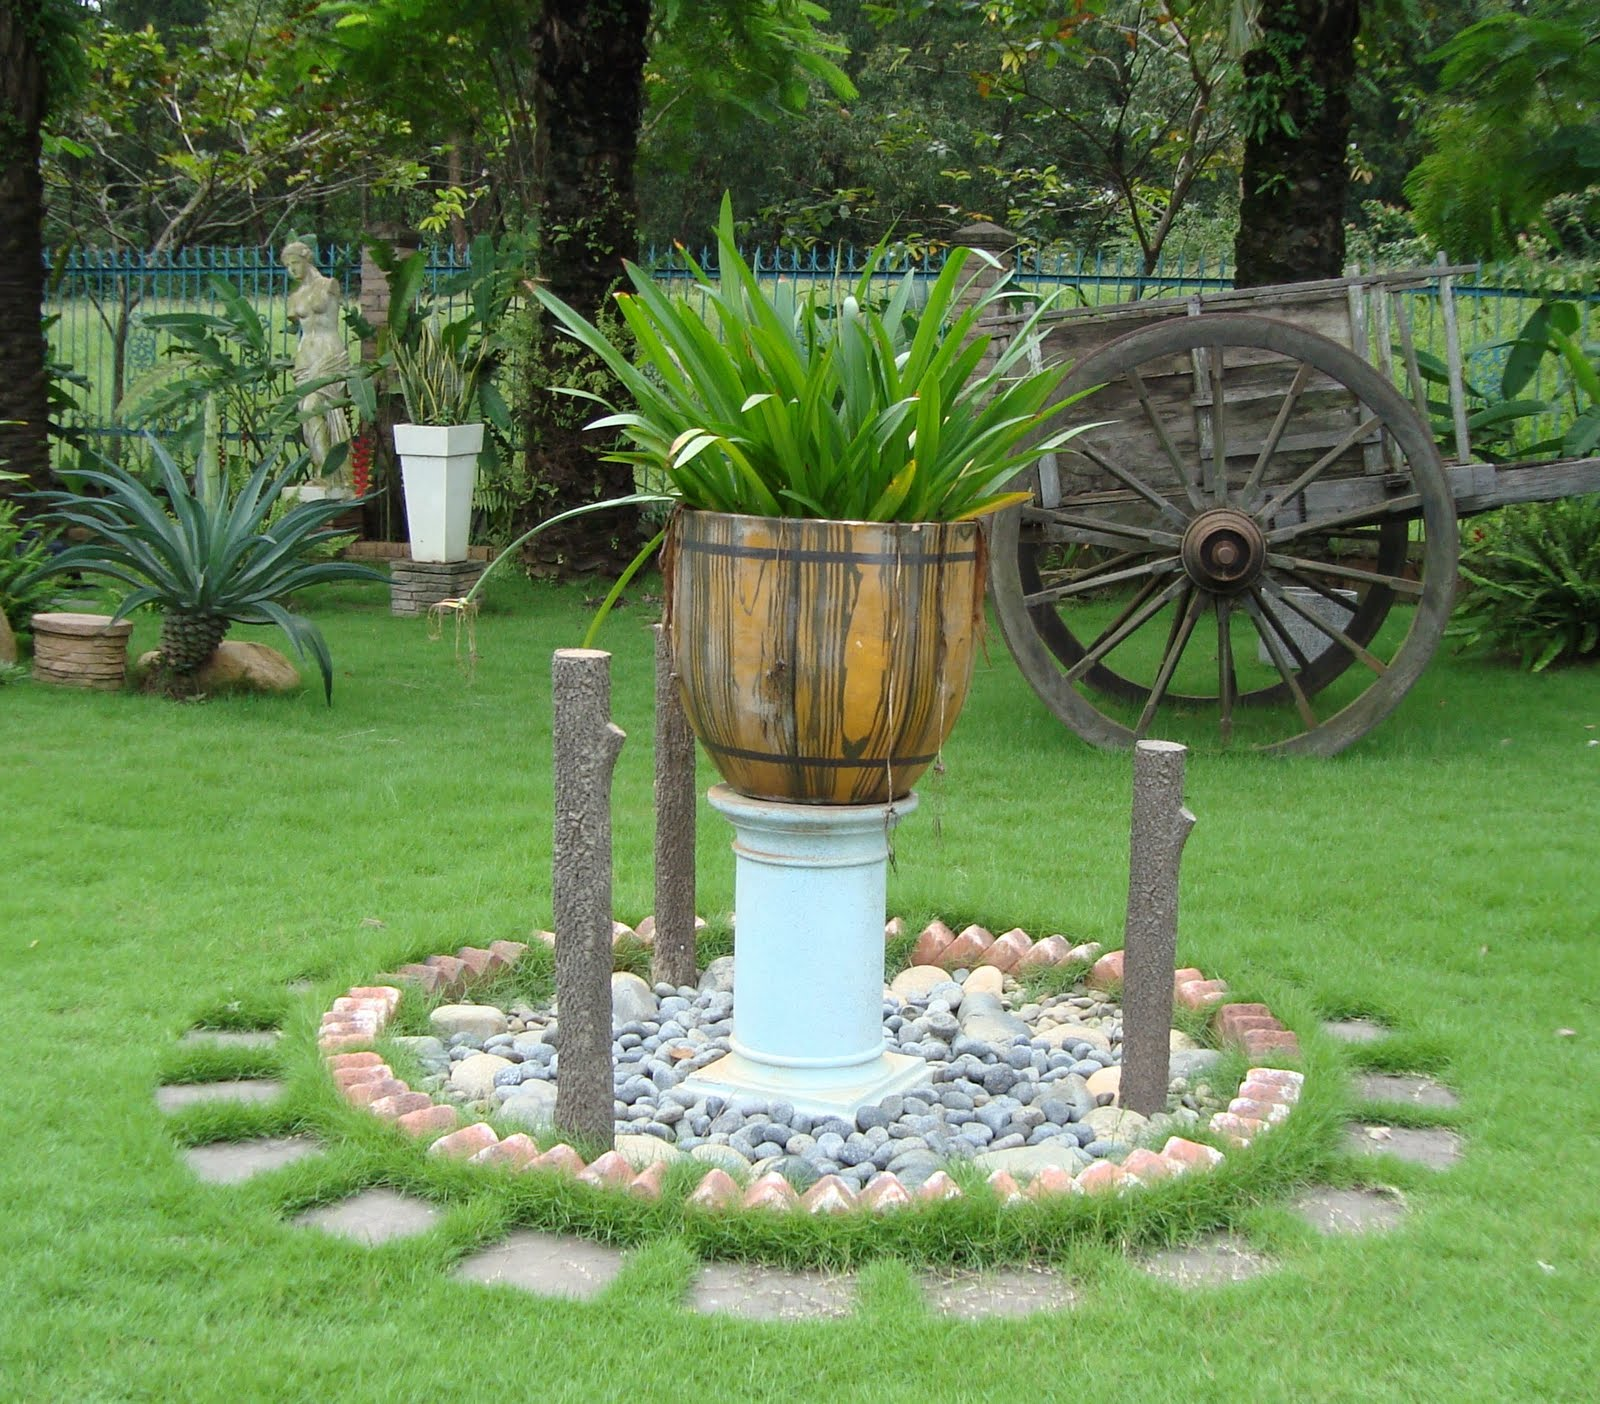 Las Mejores Fotos De Jardines En Pinterest: Andresnguyen: Stone For Landscape/ Edge Brick / La Piedra